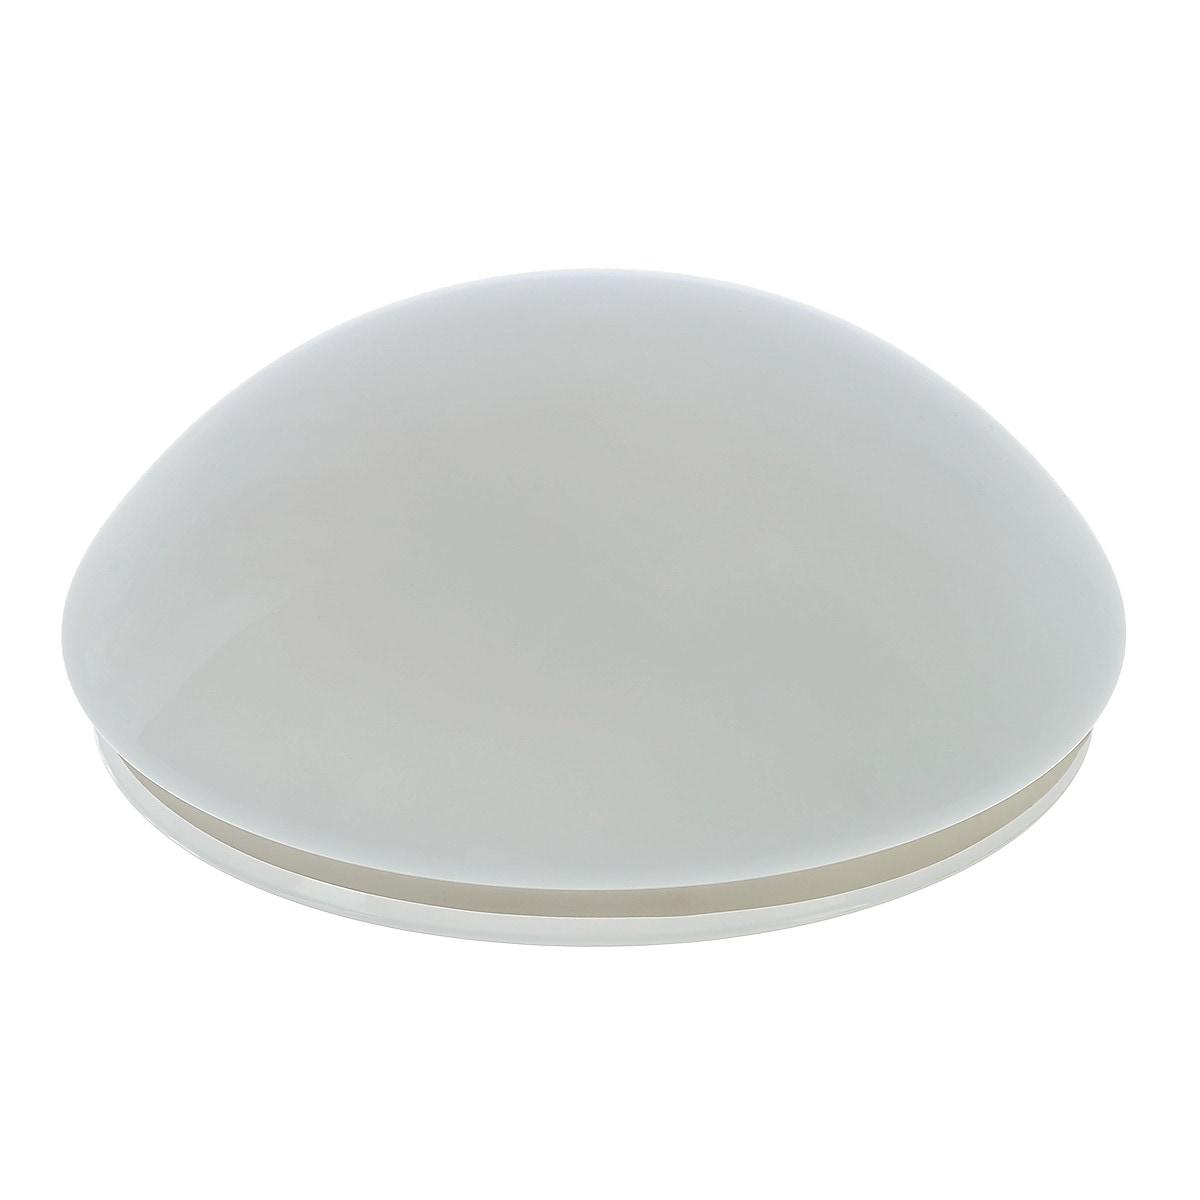 Lampunlasi